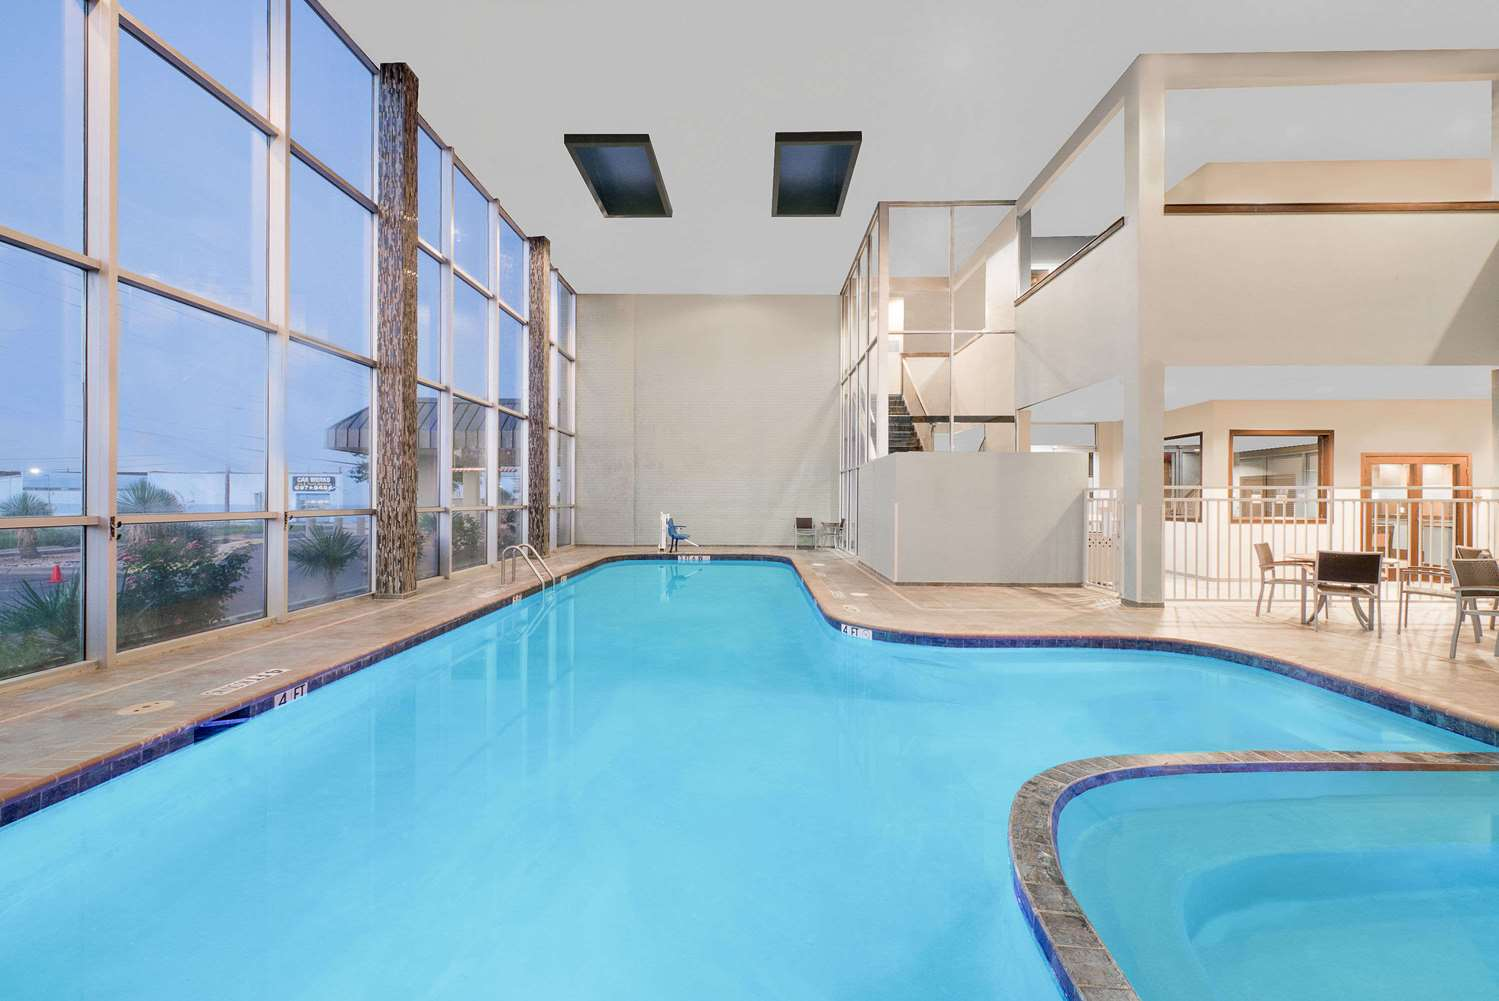 Pool - Wyndham Garden Hotel Midland